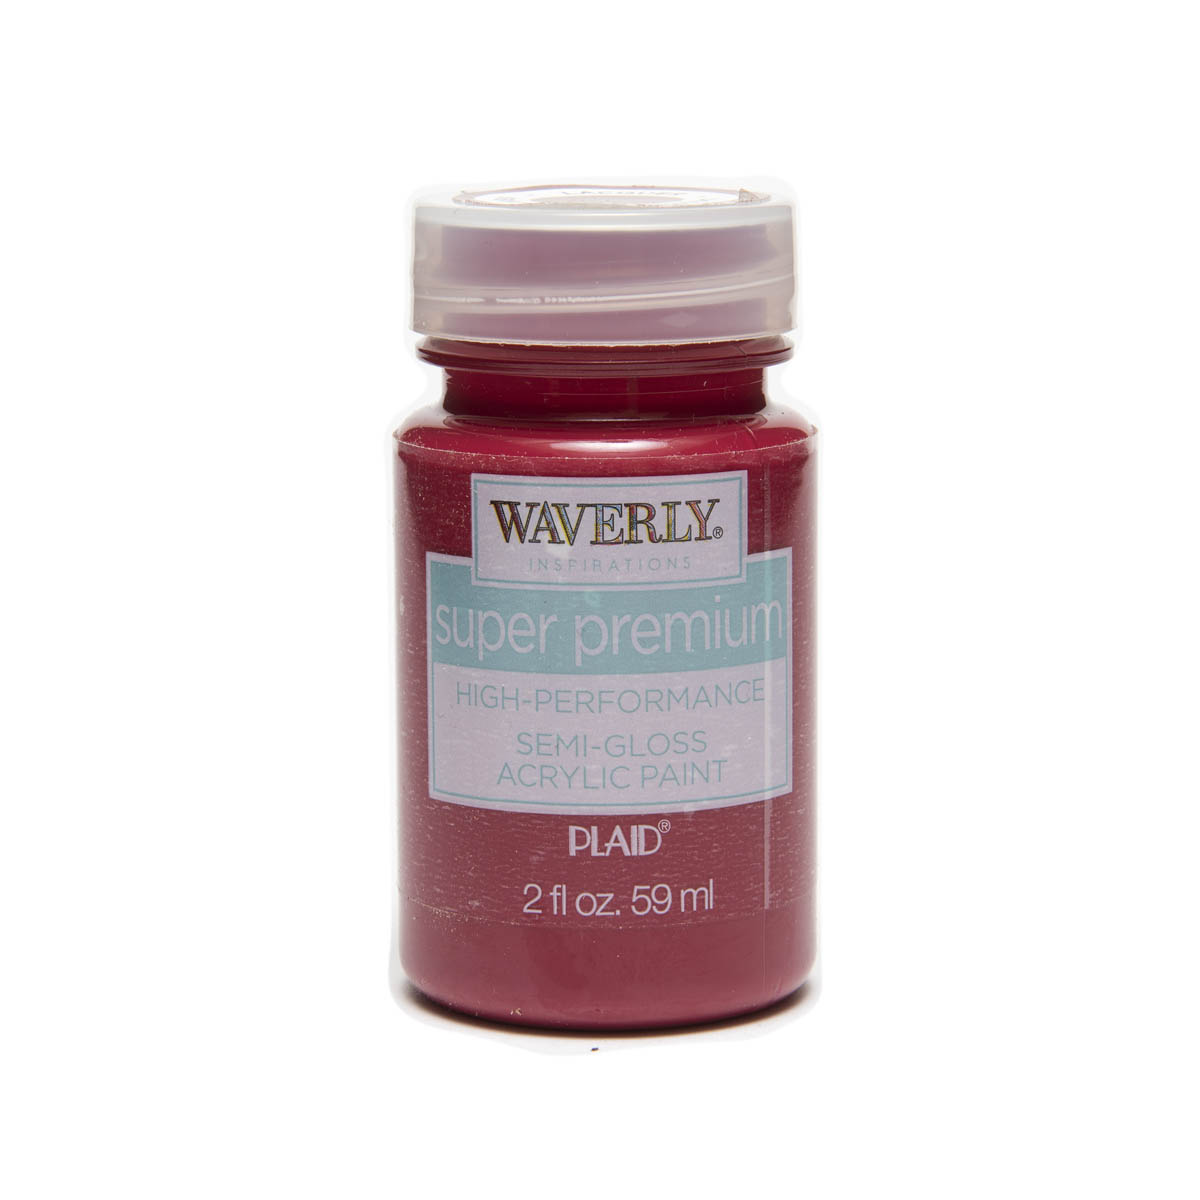 Waverly ® Inspirations Super Premium Semi-Gloss Acrylic Paint - Lacquer, 2 oz. - 60610E